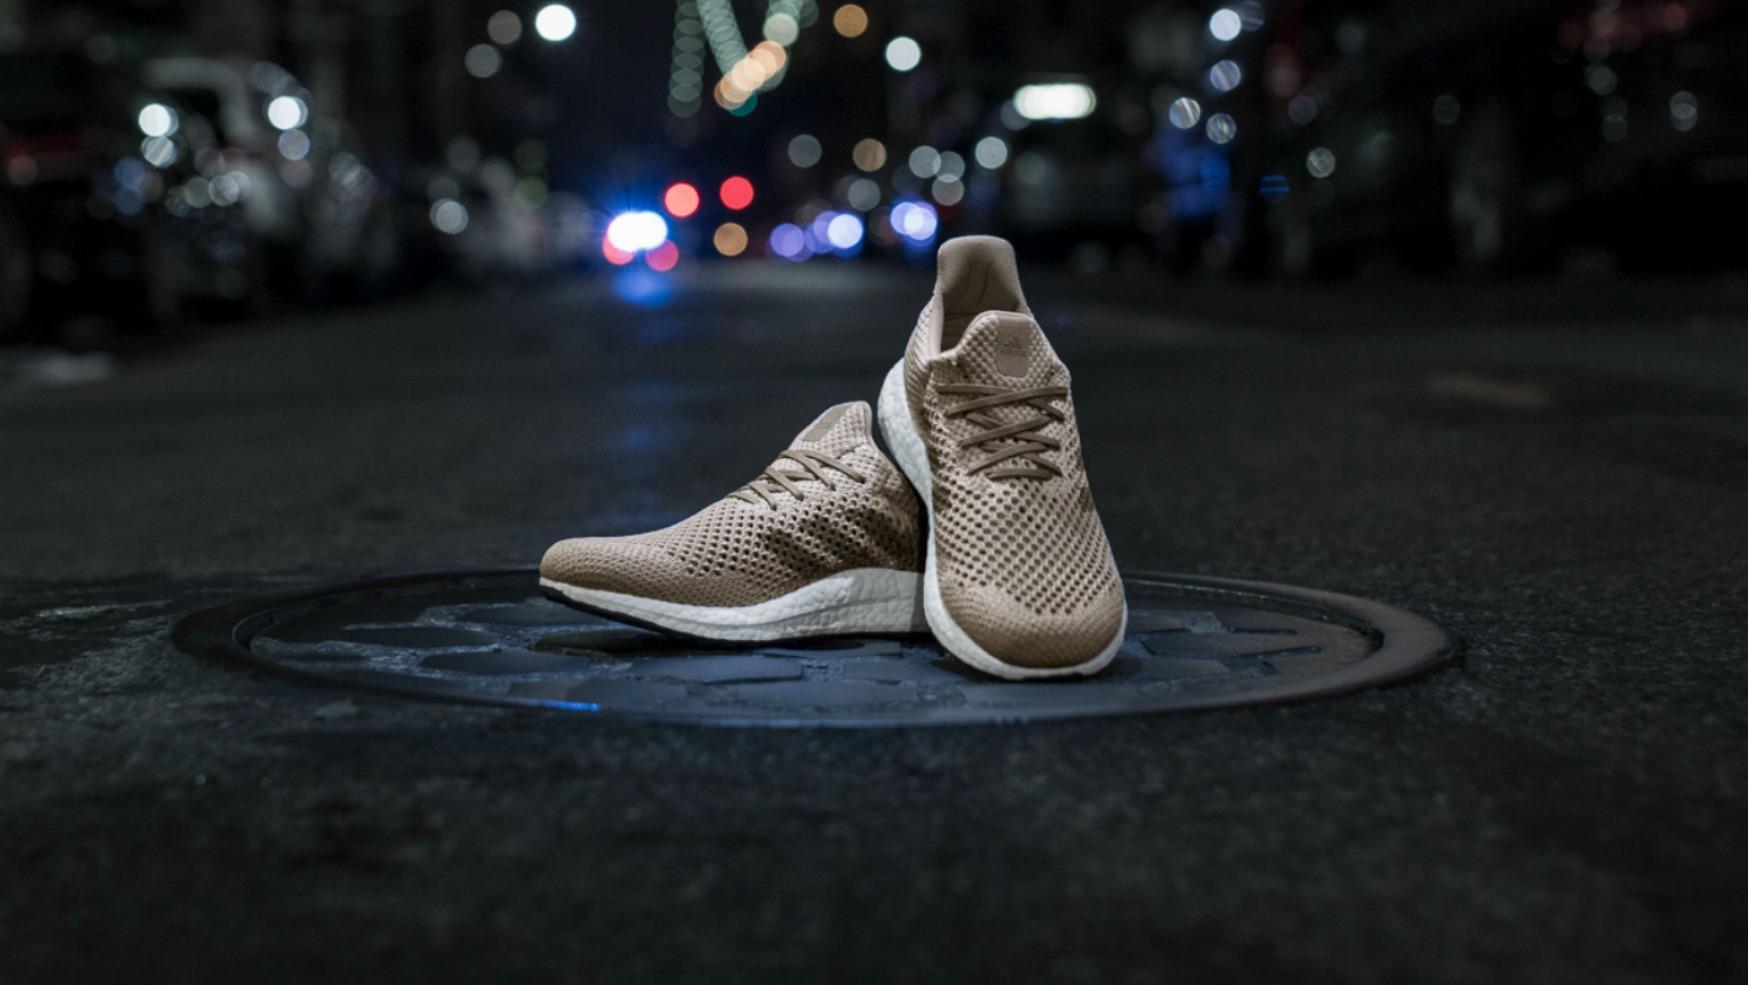 Adidas crée des baskets en fibre Biosteel 100